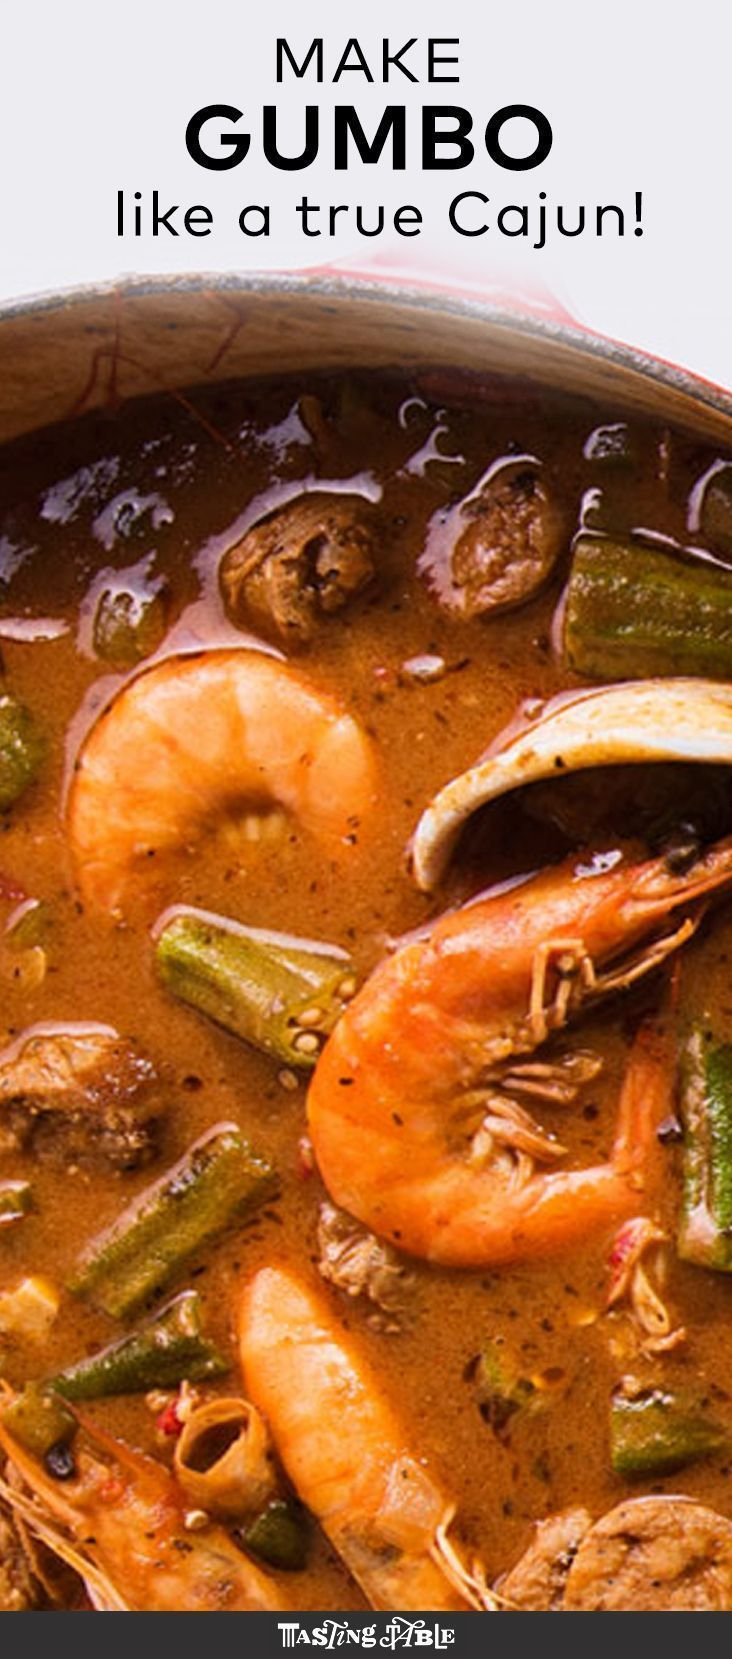 Make a jumbo pot of Louisiana-style seafood gumbo.